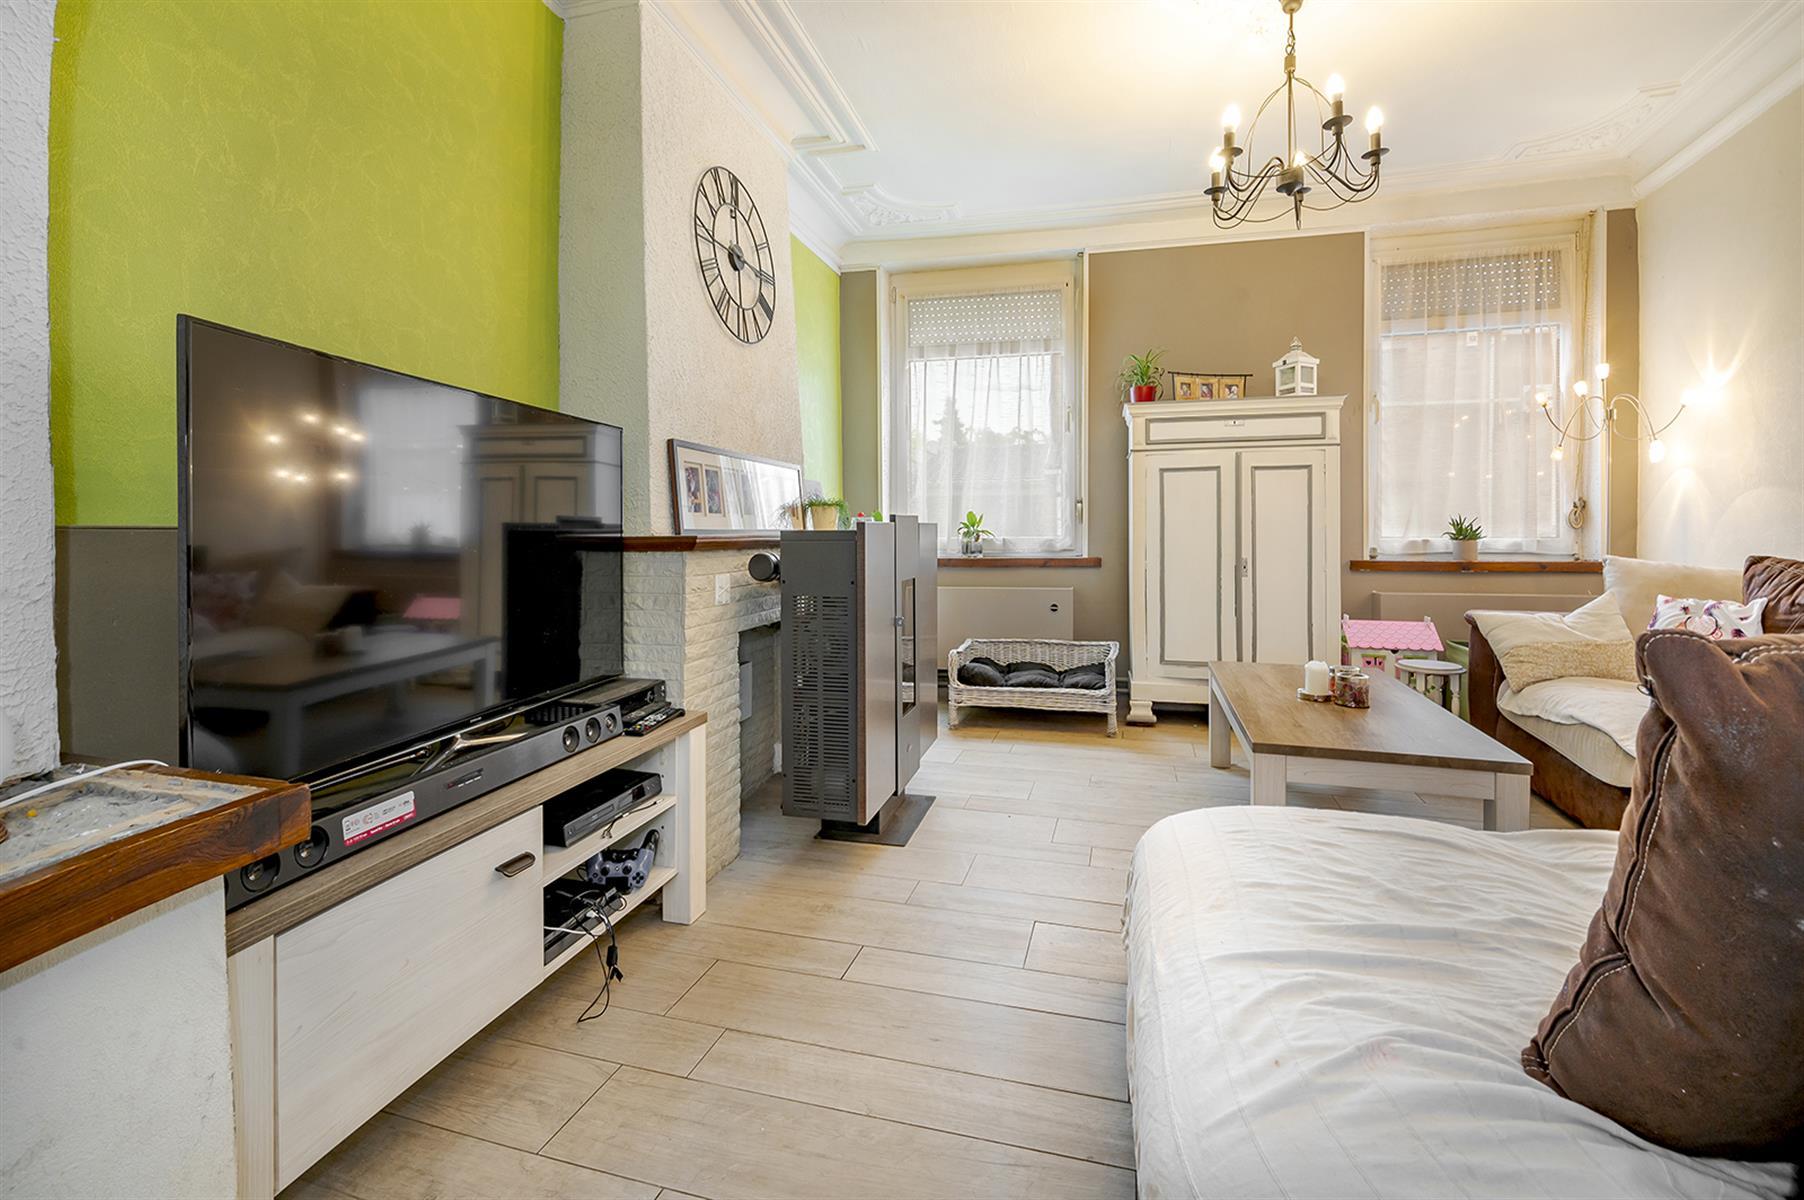 Maison - Oreye - #4174883-2